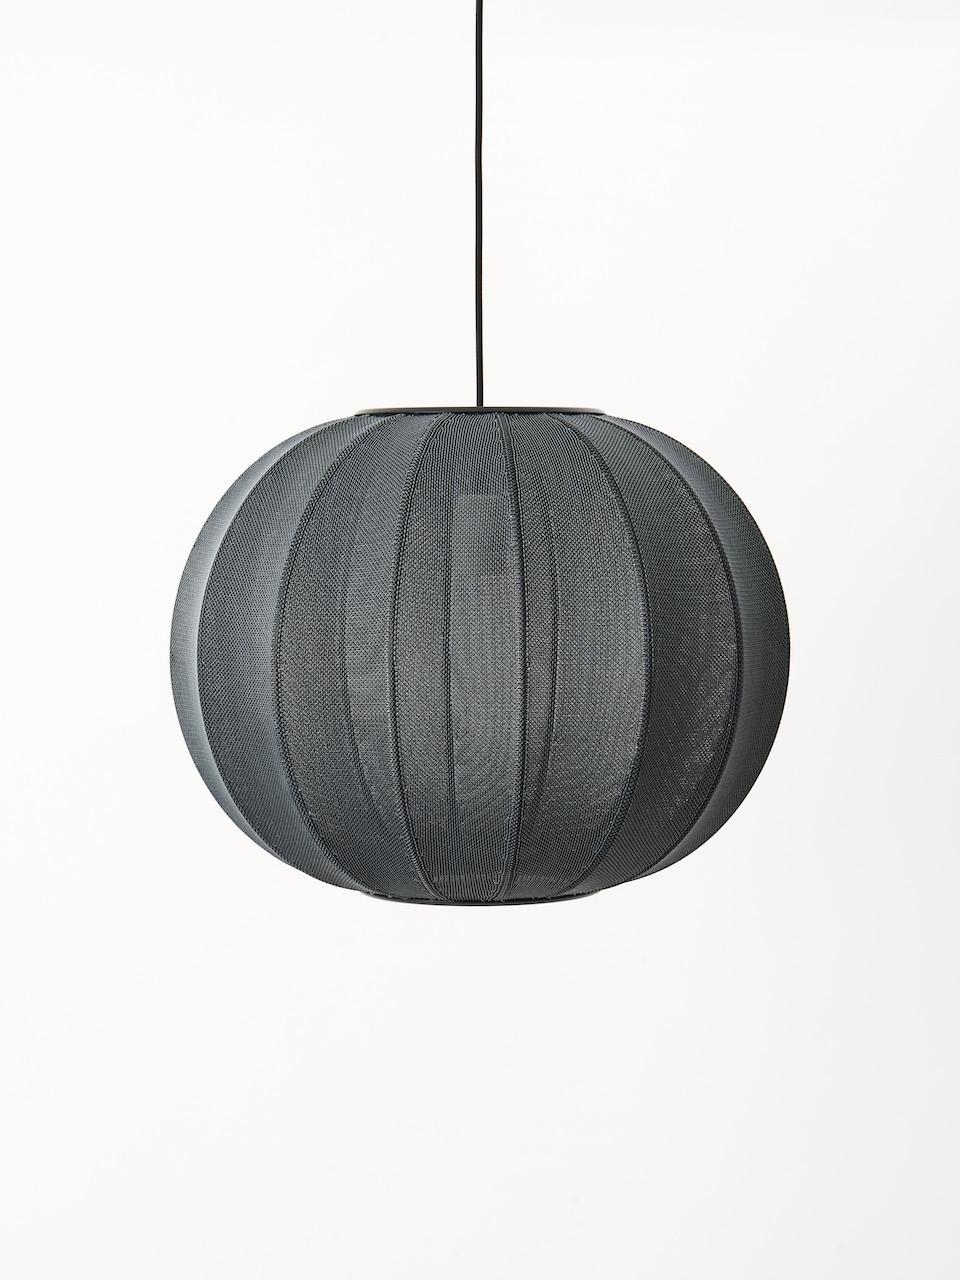 Made by Hand Knit Wit Pendelleuchte black ø60cm